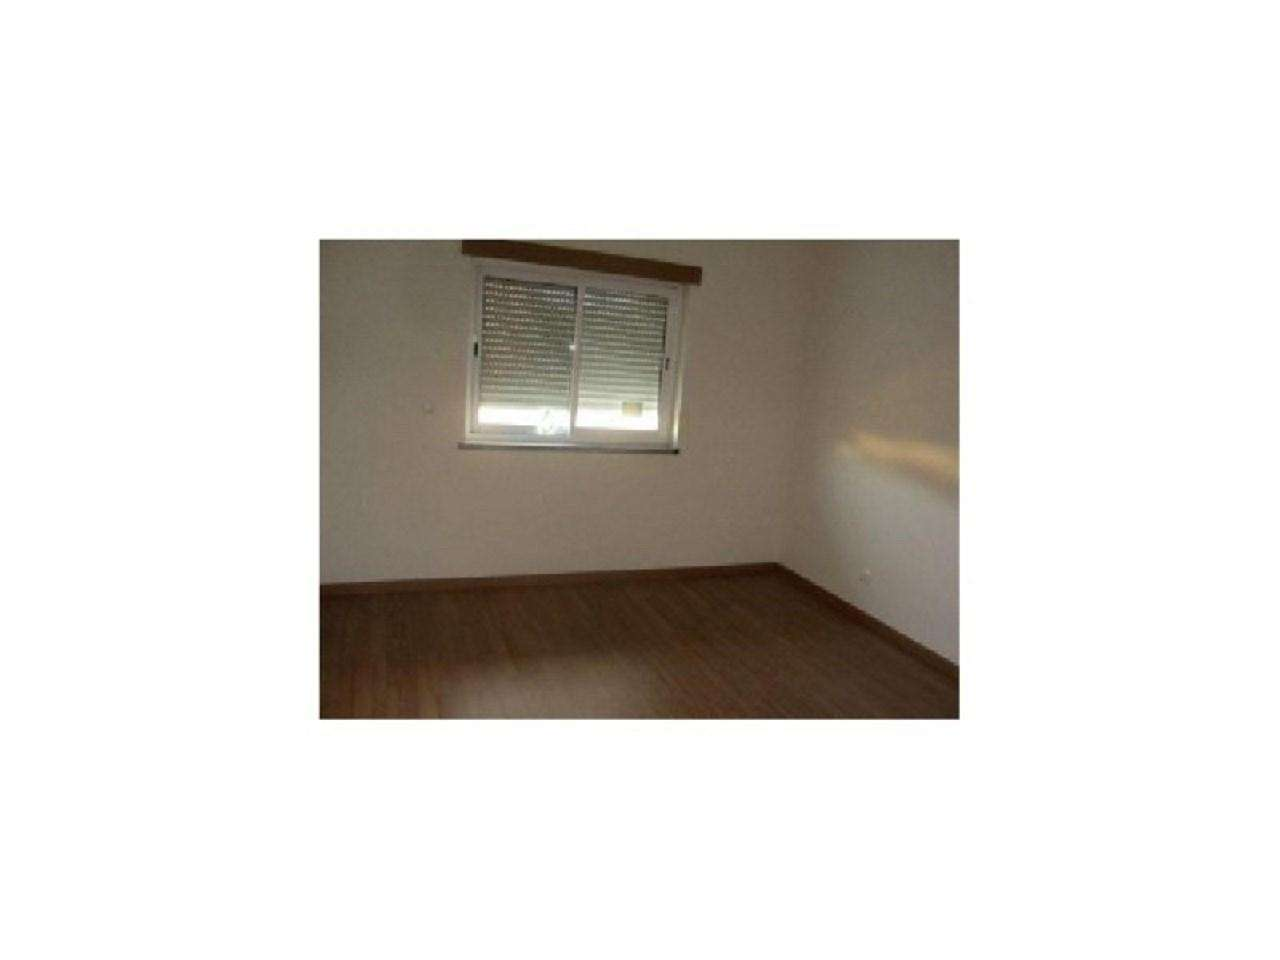 Apartamento para comprar, Caria, Castelo Branco - Foto 3